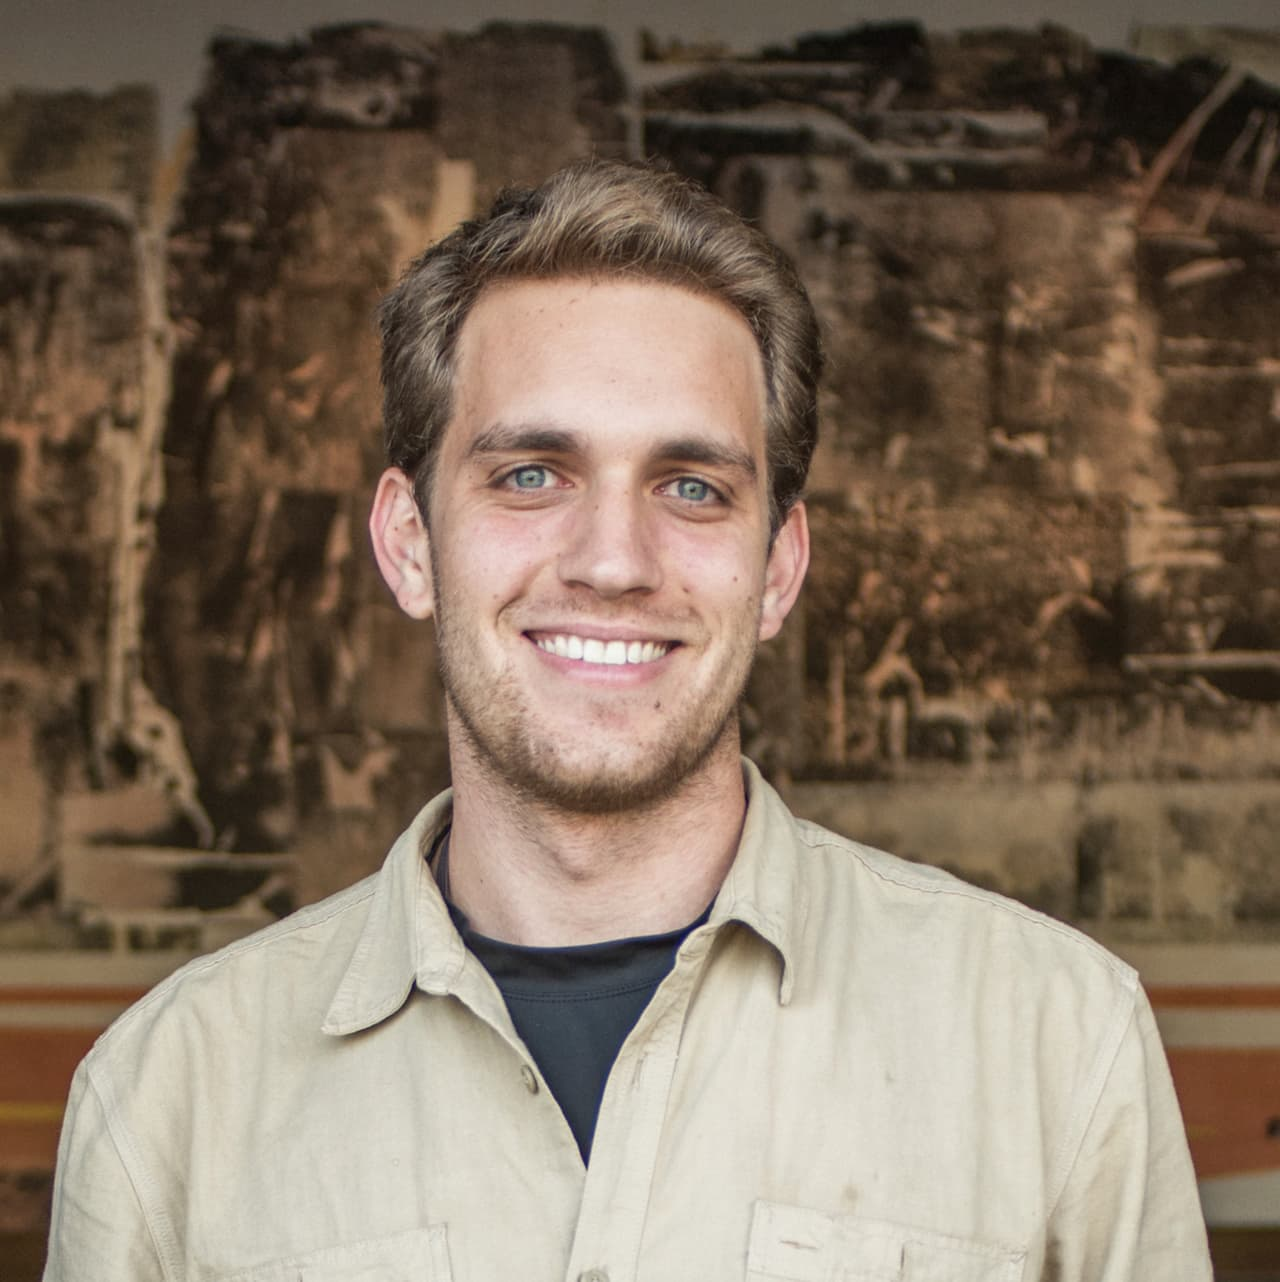 Matt Sheehan